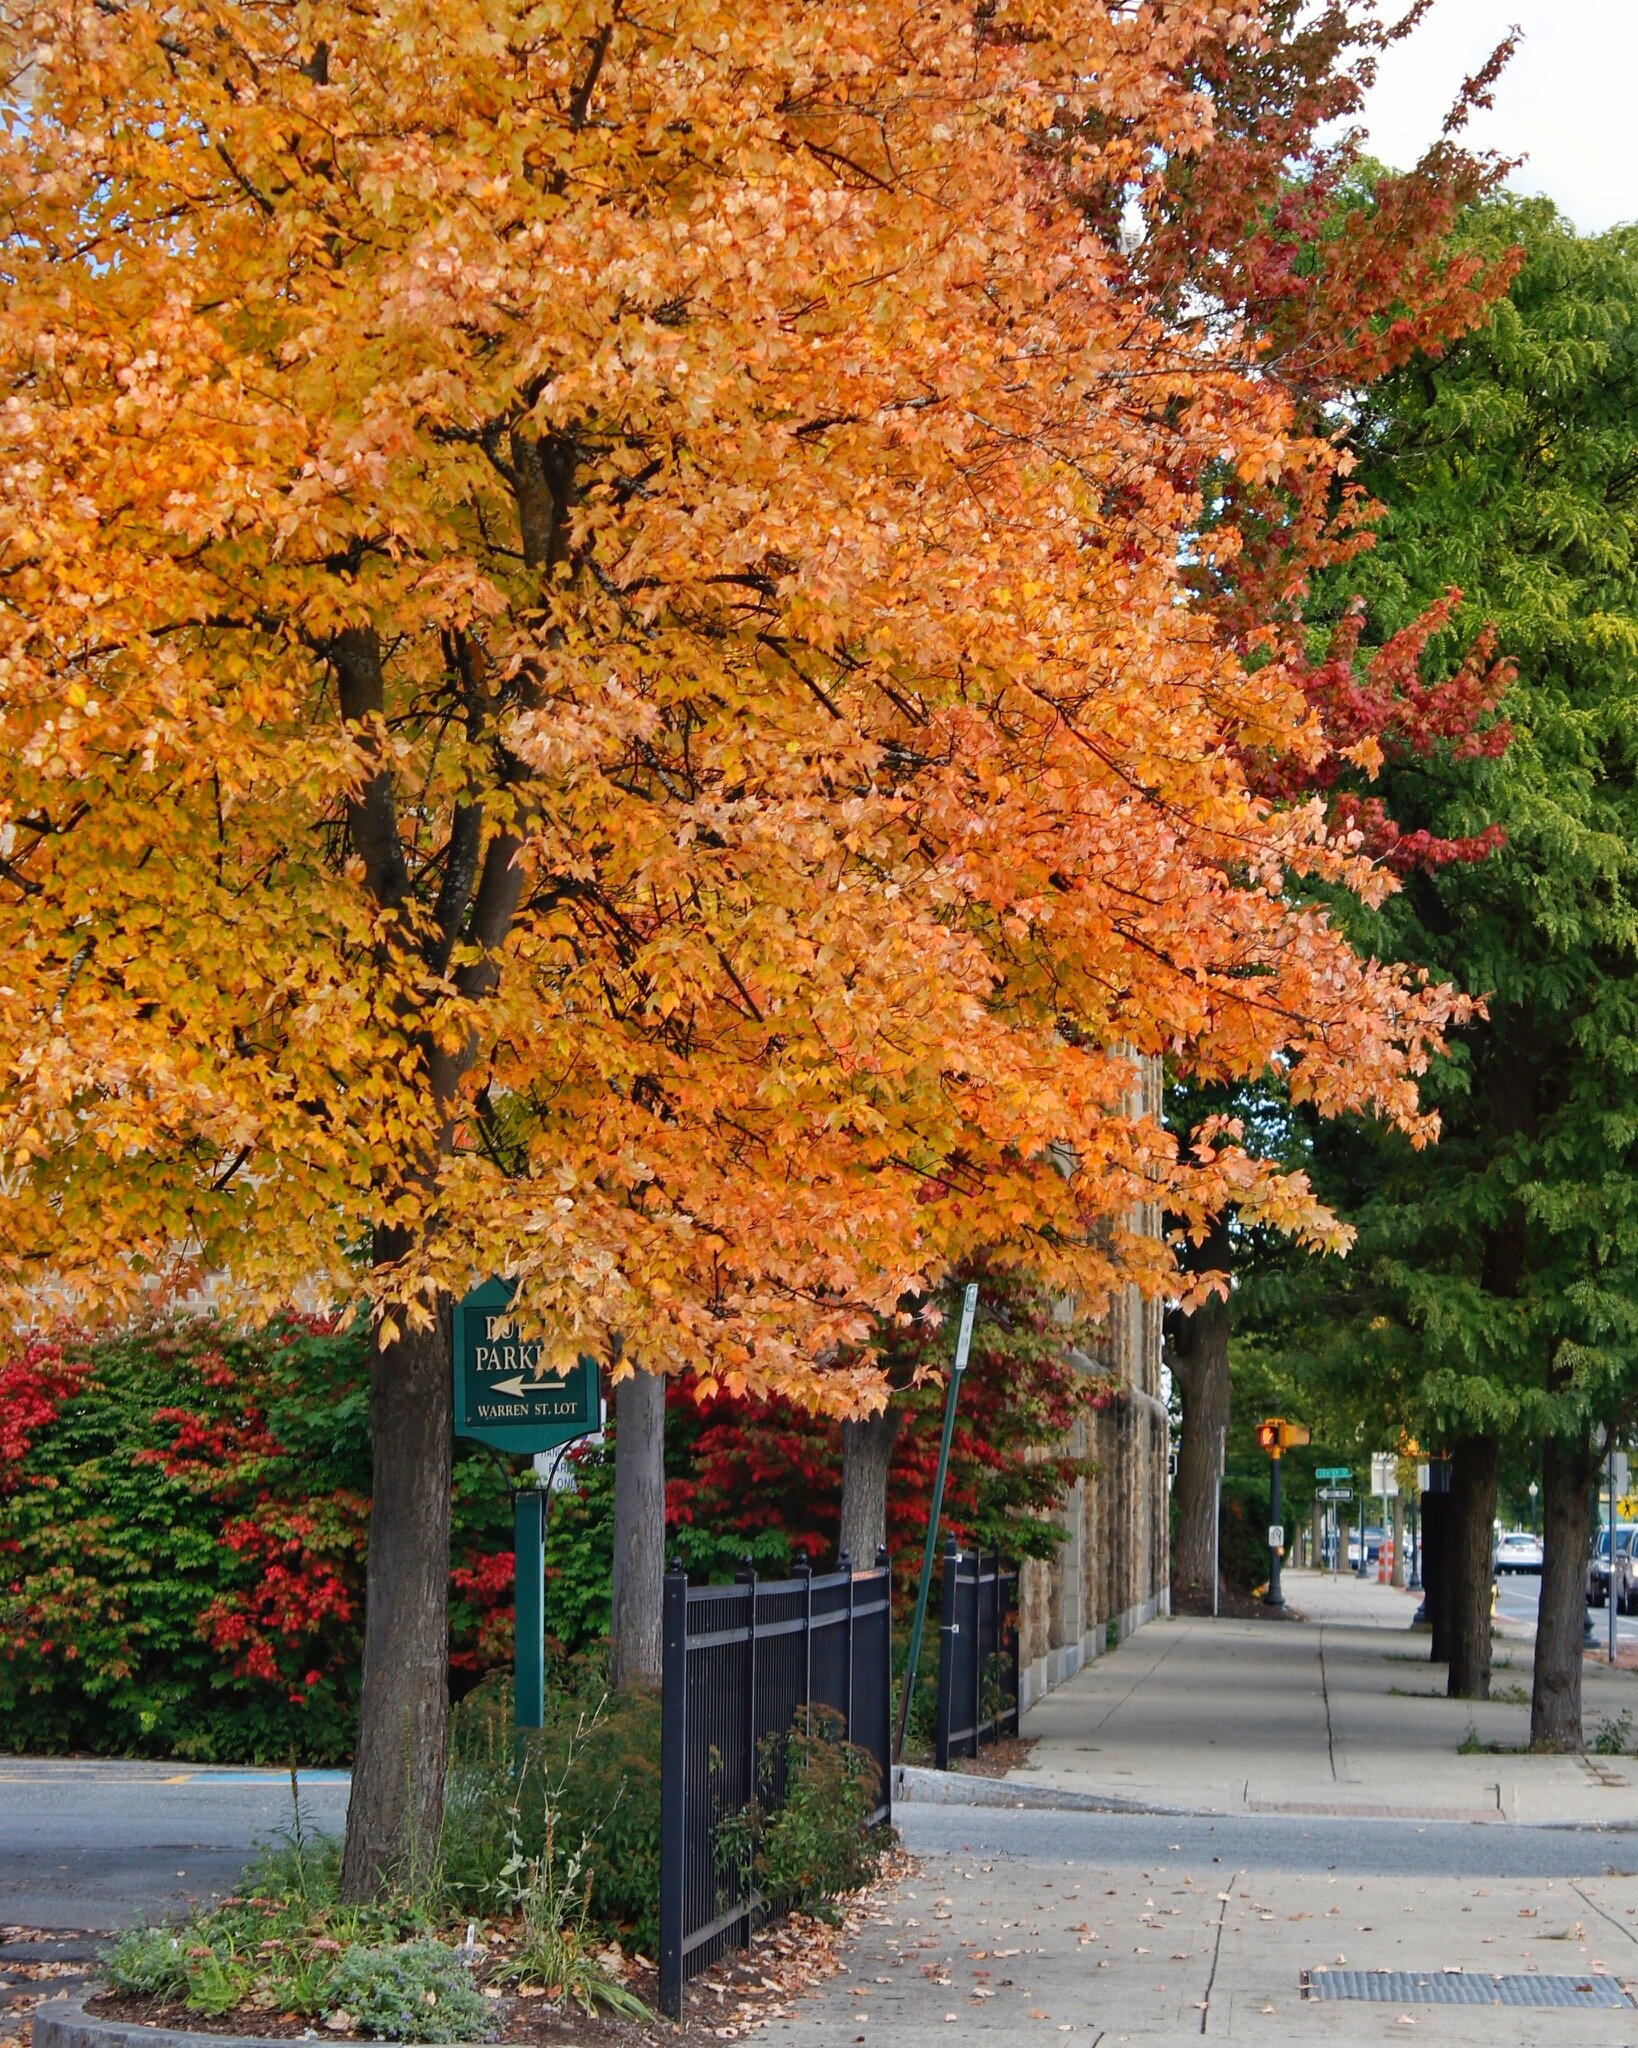 Downtown Glens Falls NY